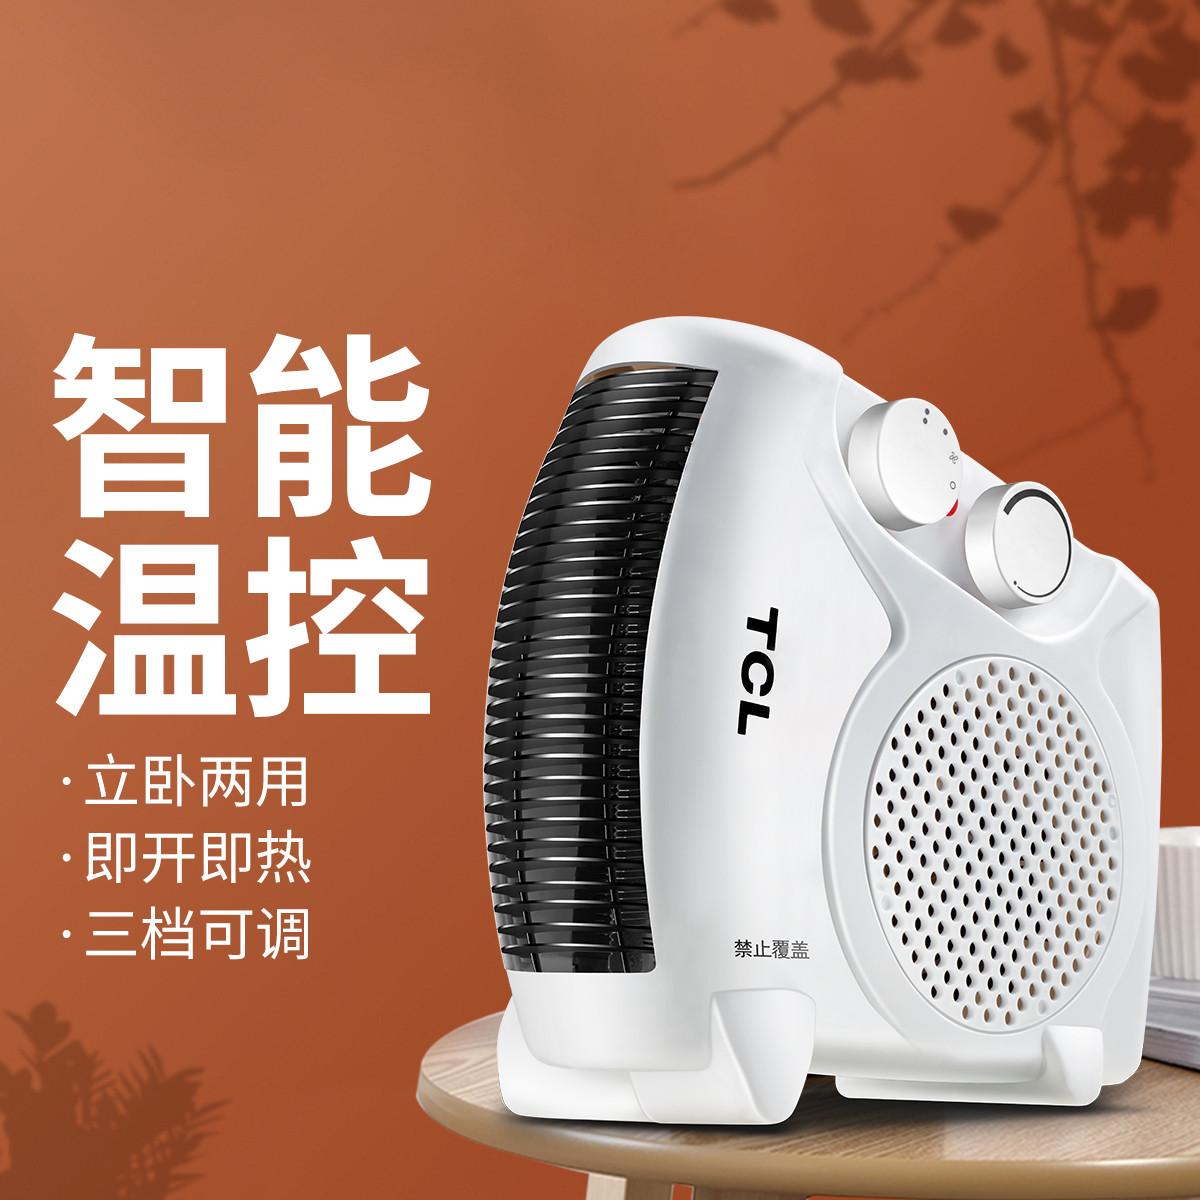 TCL取暖器电暖风机家用电暖气小太阳节能省电小型办公室速热风扇